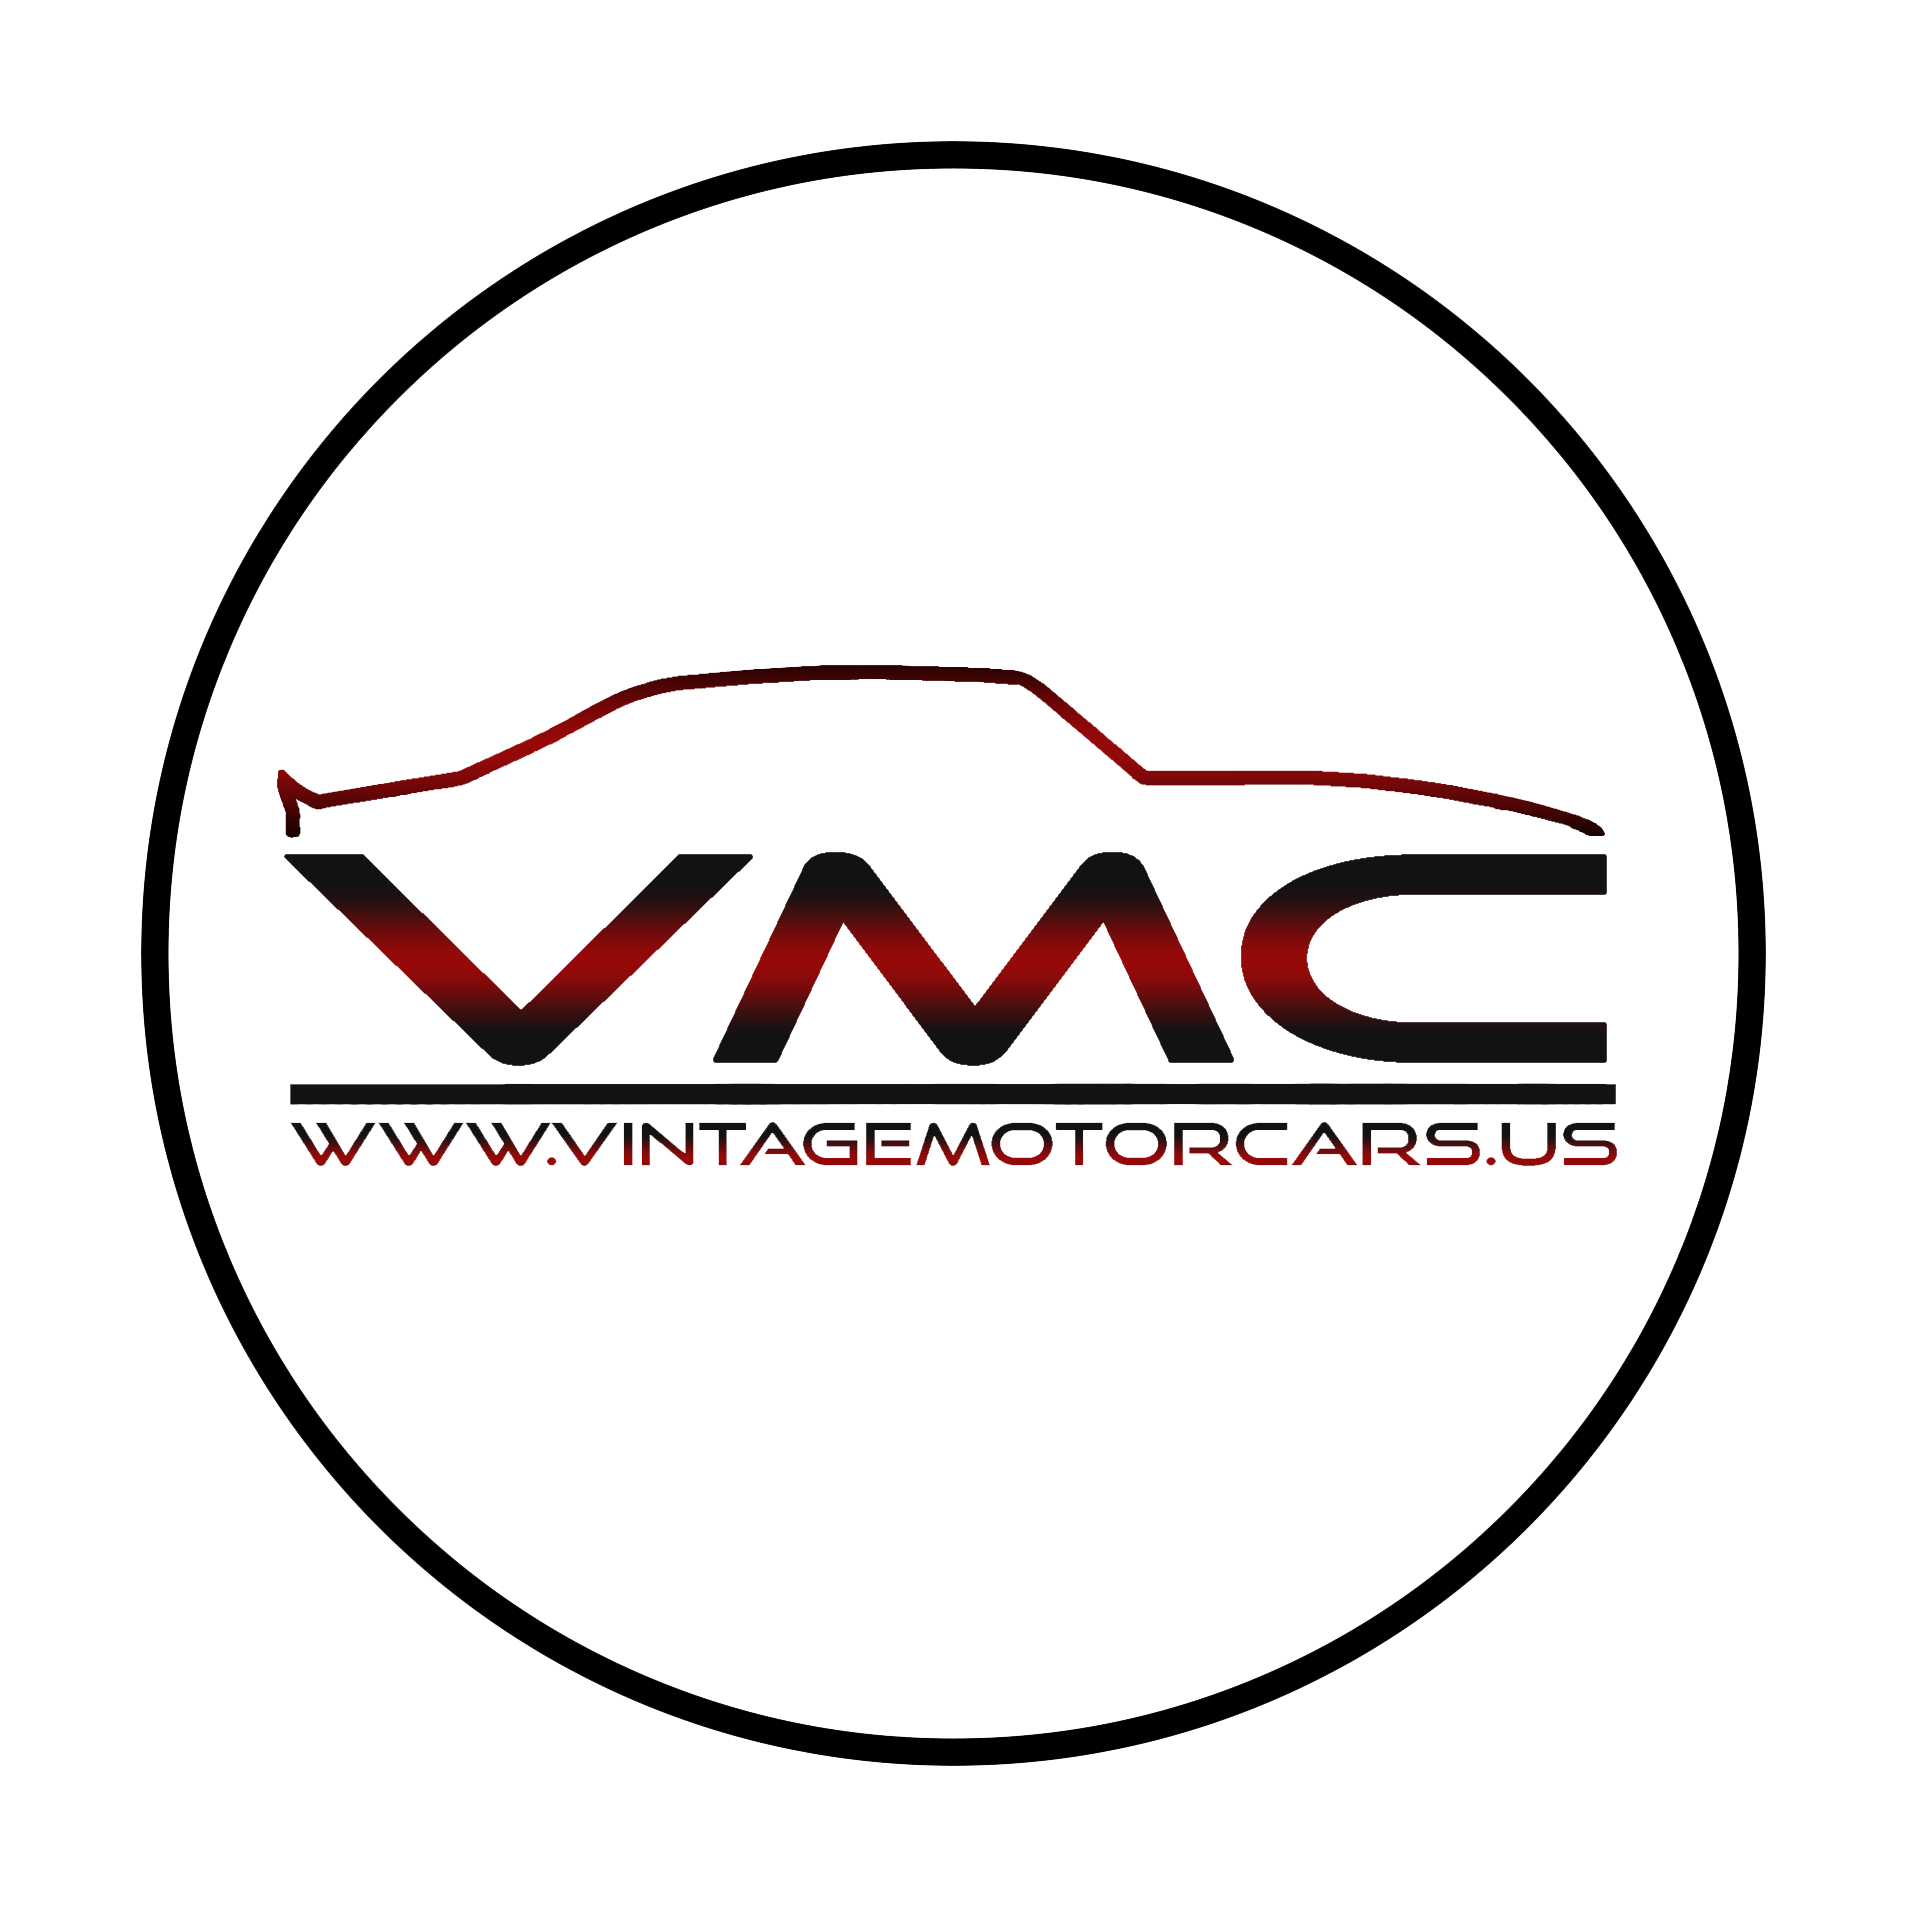 Vintage Motorcars Logo